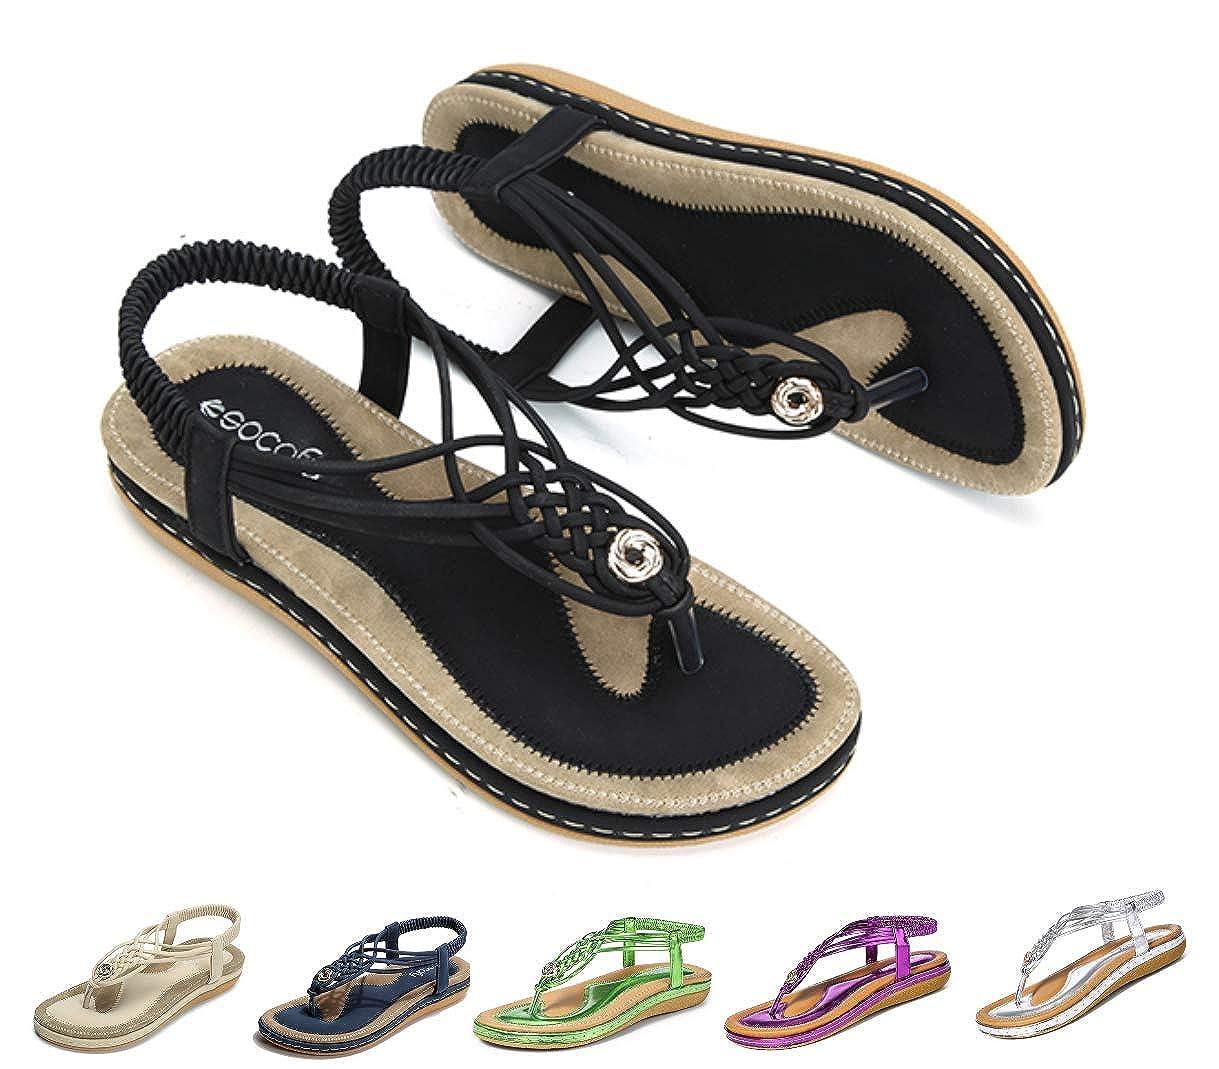 a6d24228b8 Socofy Women's Flat Sandals Summer Beach Walking Sandals Shoes Clip Toe  Flip Flops Thongs Bohemian Wedge Shoes Ladies Slip On Open Toe T-Strap  Braided ...